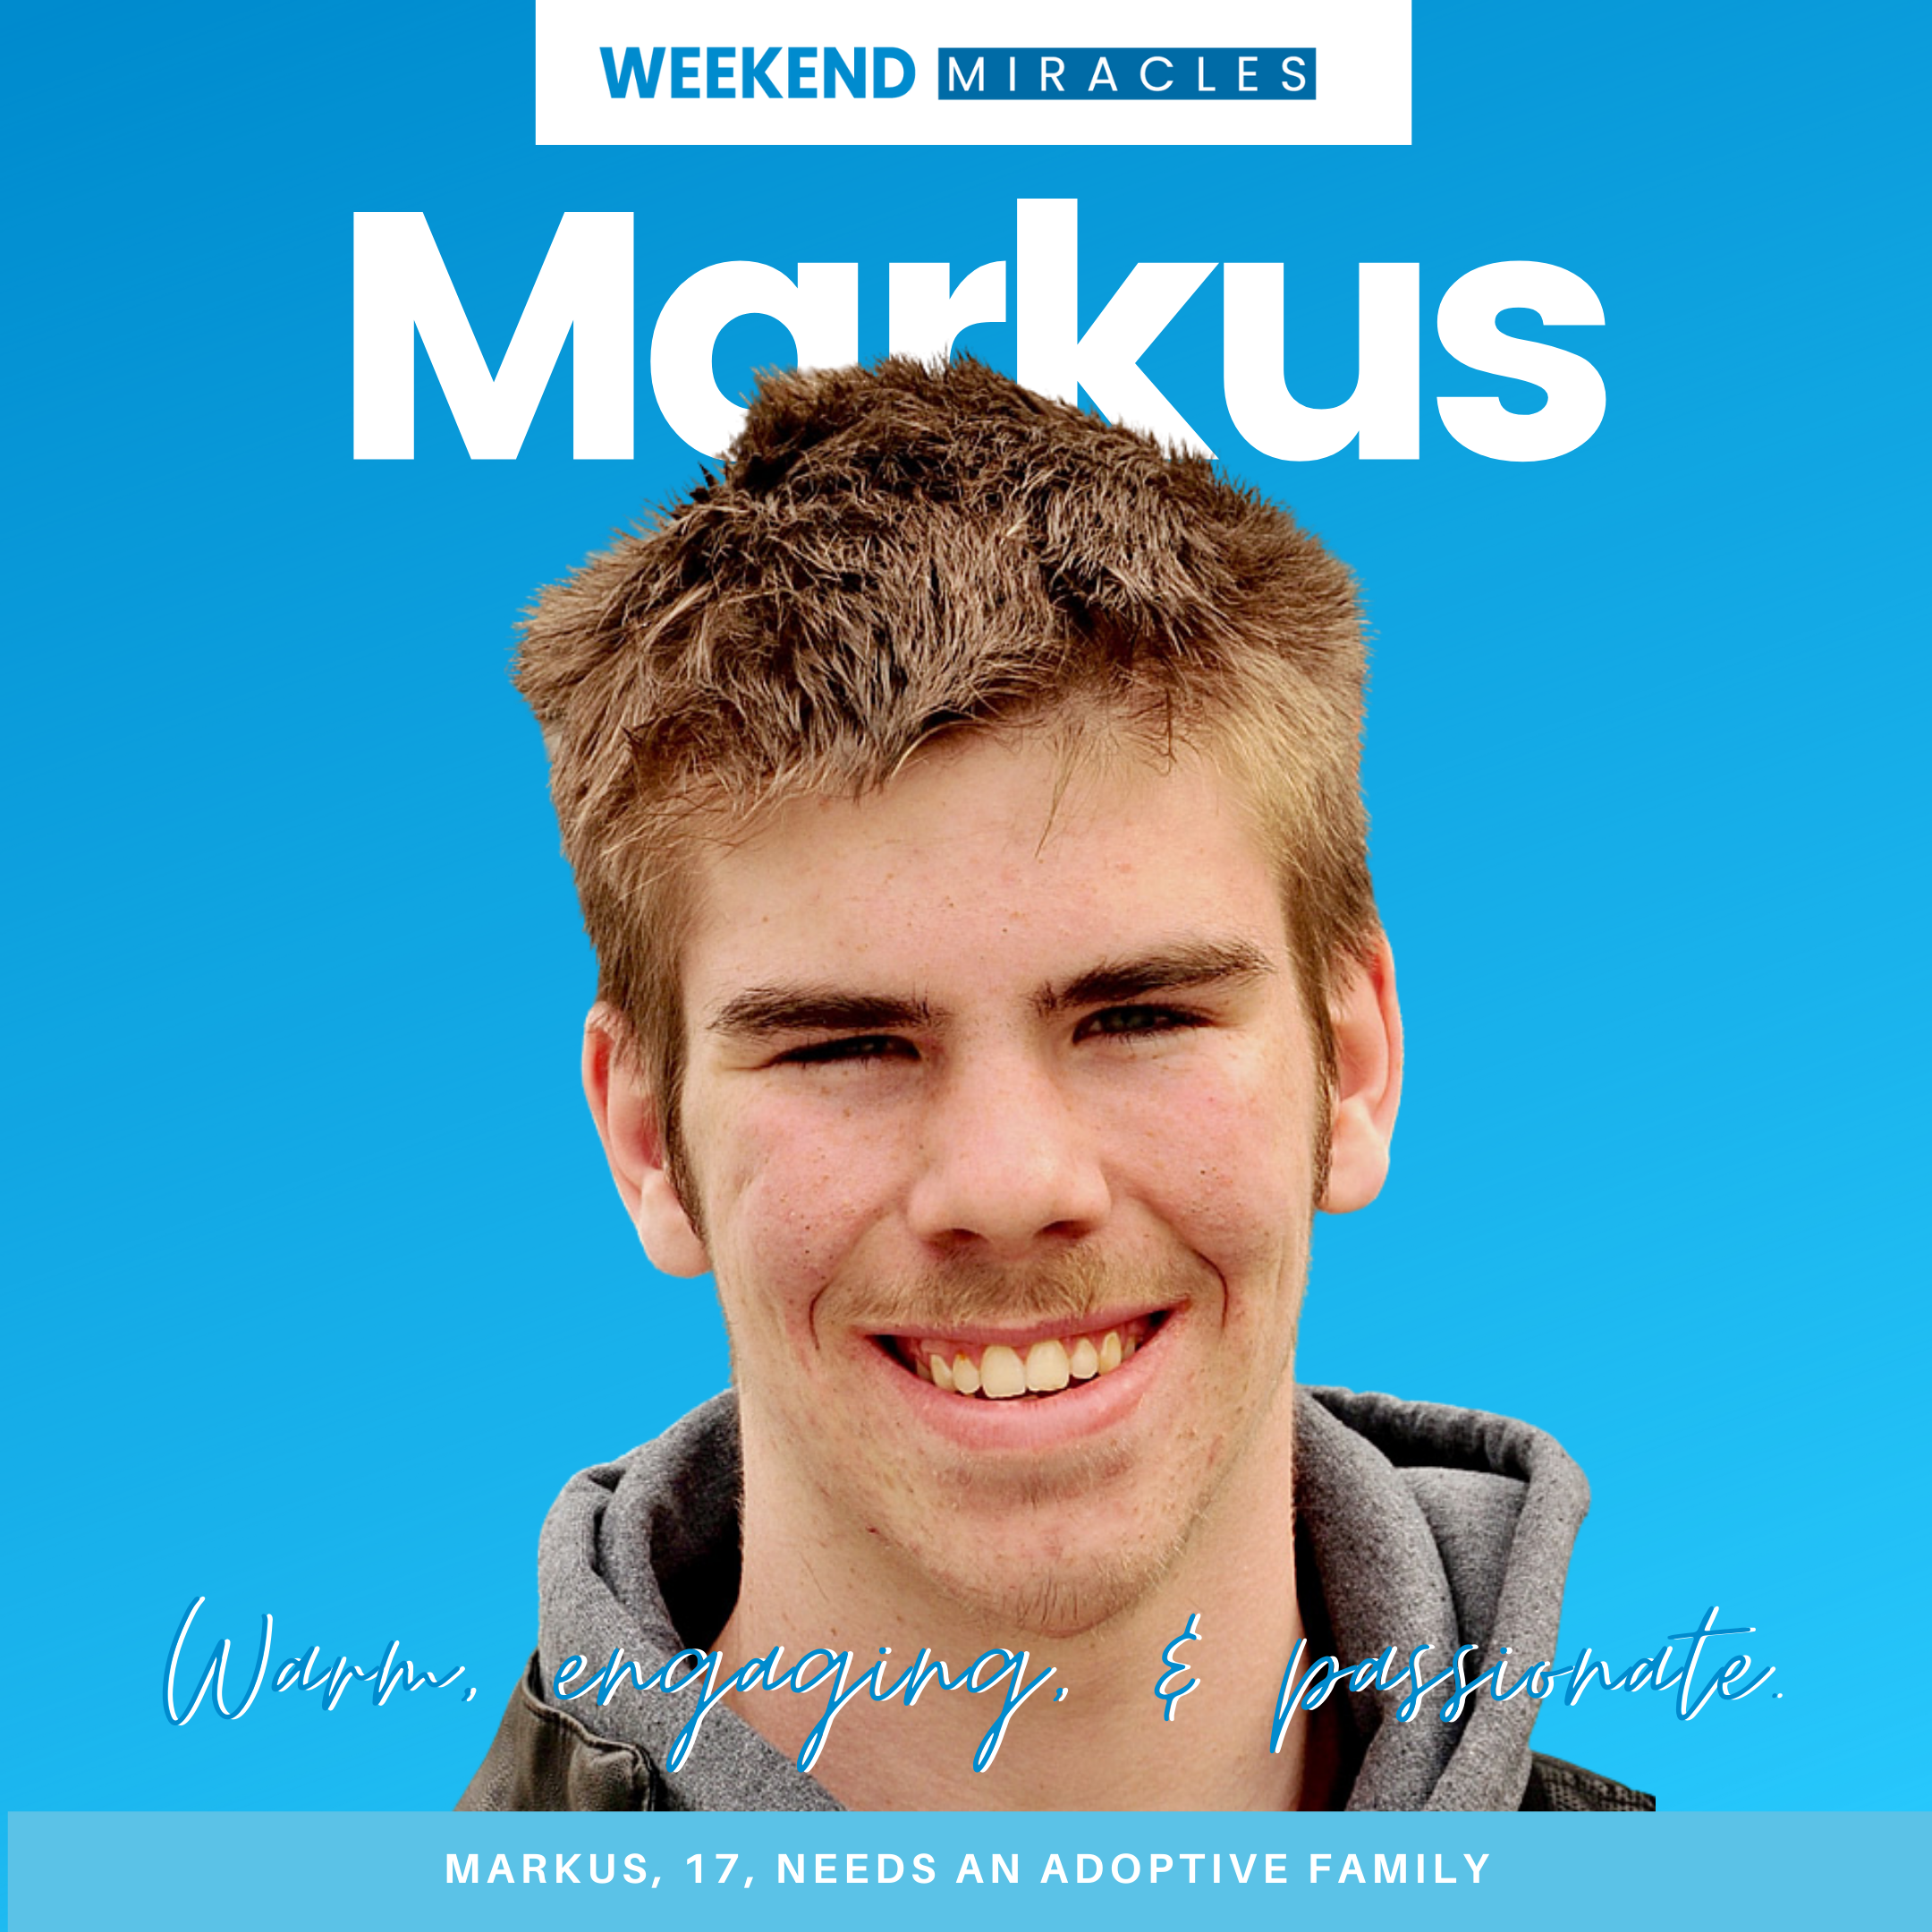 Meet Markus